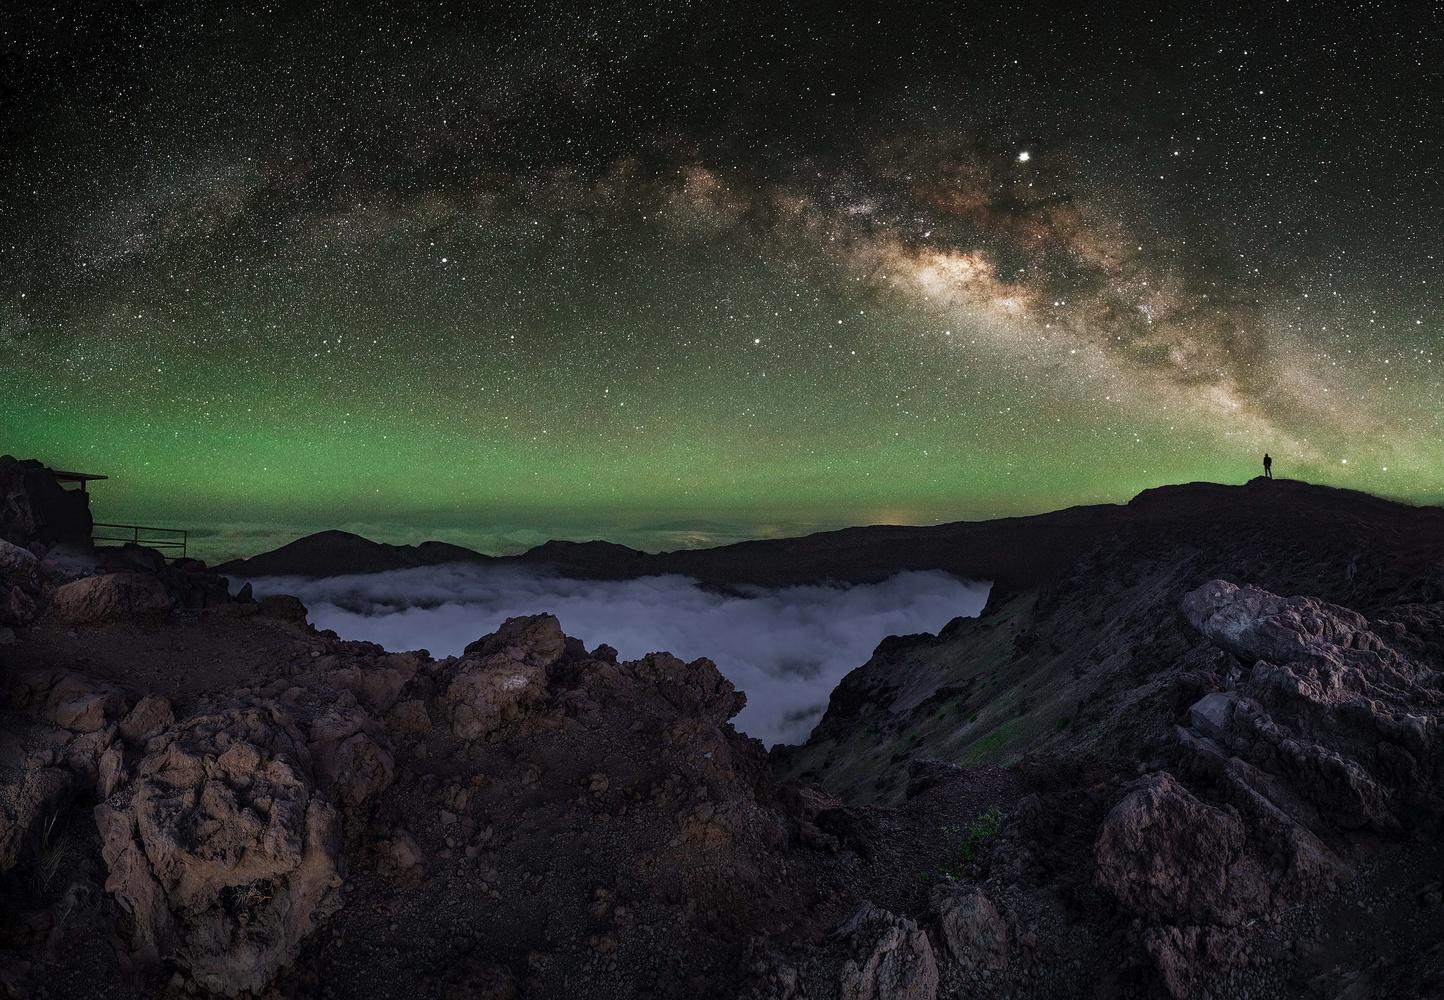 House of the Stars by John Vander Ploeg